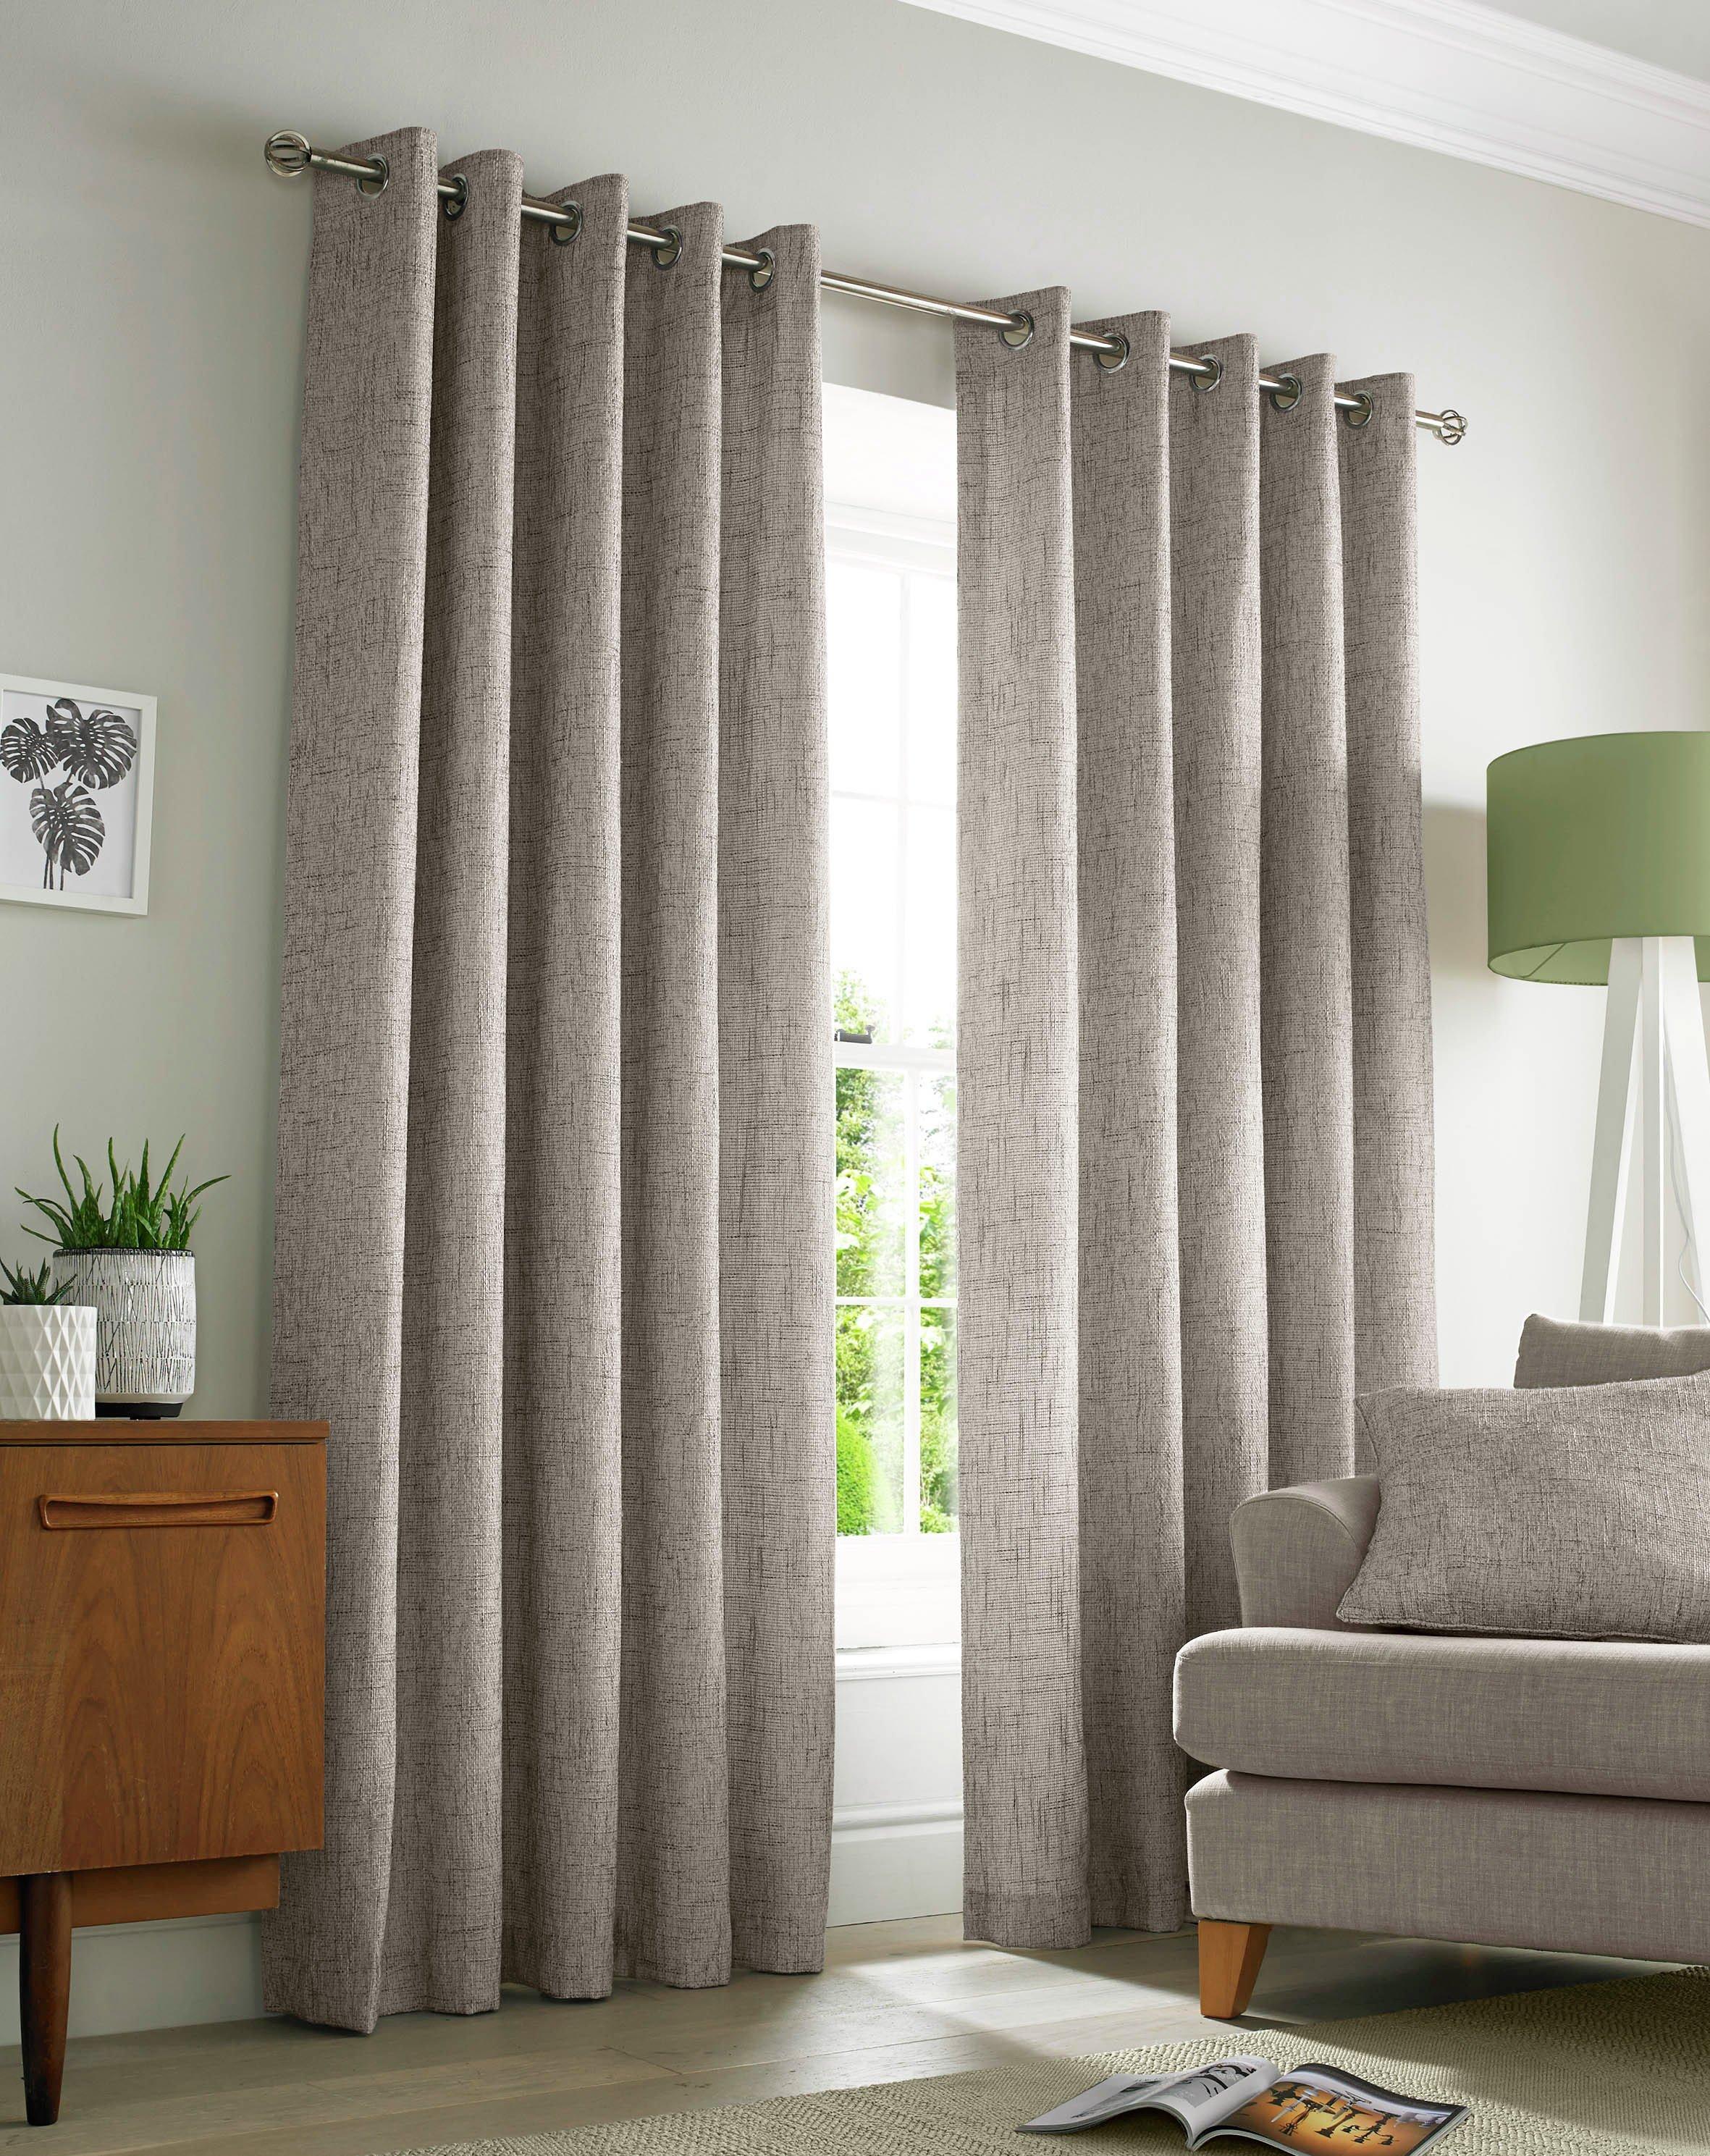 Academy Eyelet Curtains - 229x229cm - Natural.